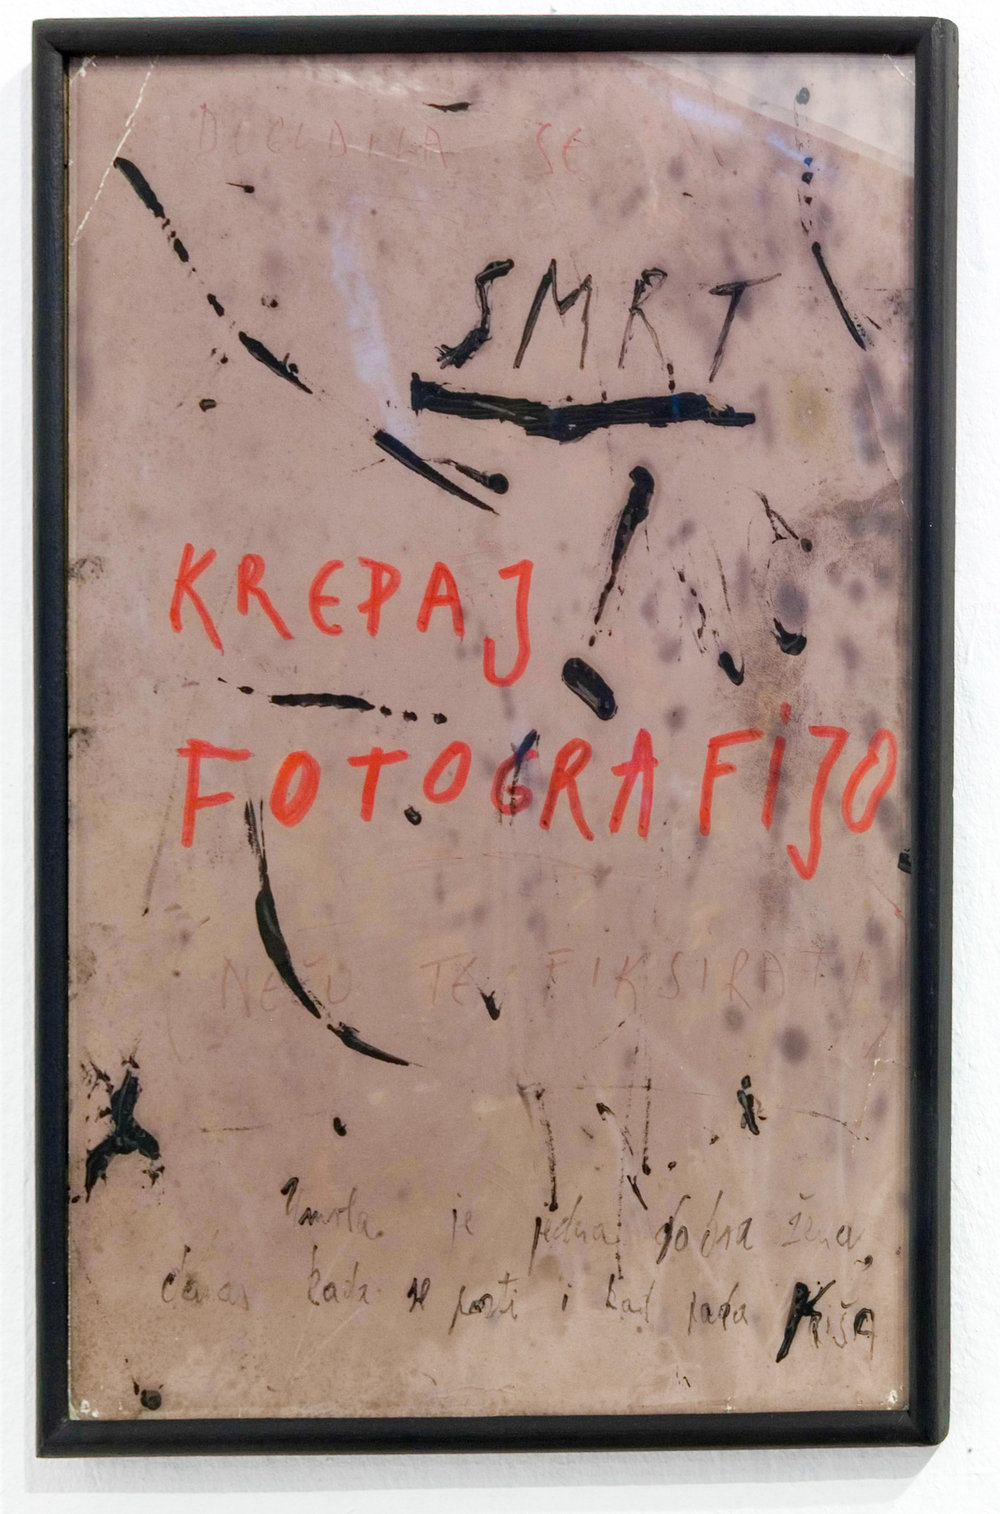 DROP DEAD PHOTOGRAPH (1973) photographic paper, tempera, marker